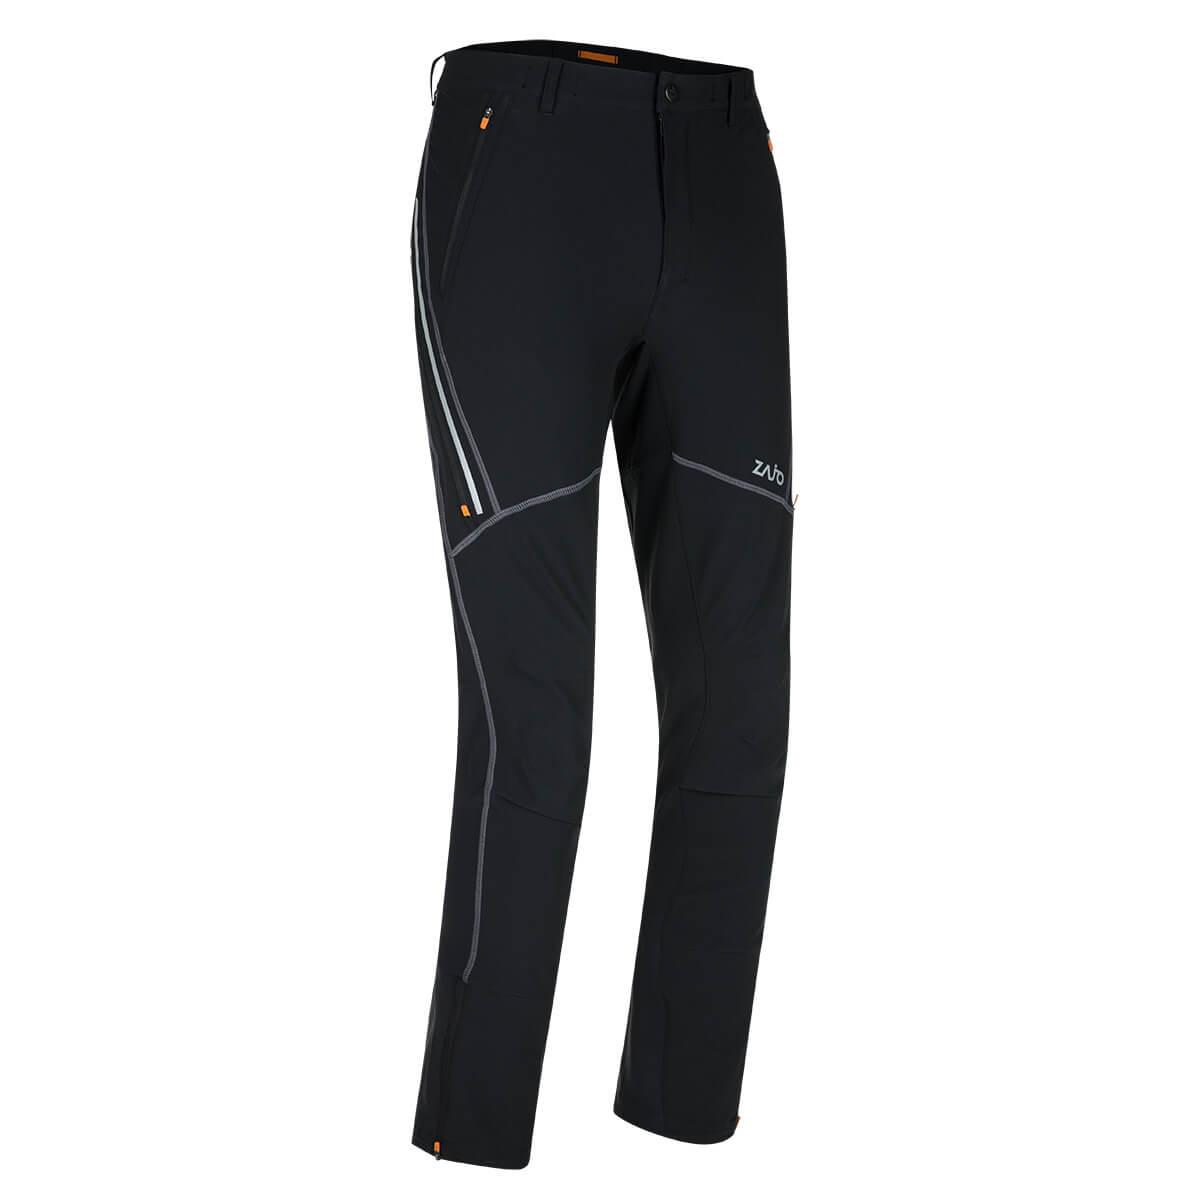 Zajo Reisa Pants nohavice Black - veľkosť M